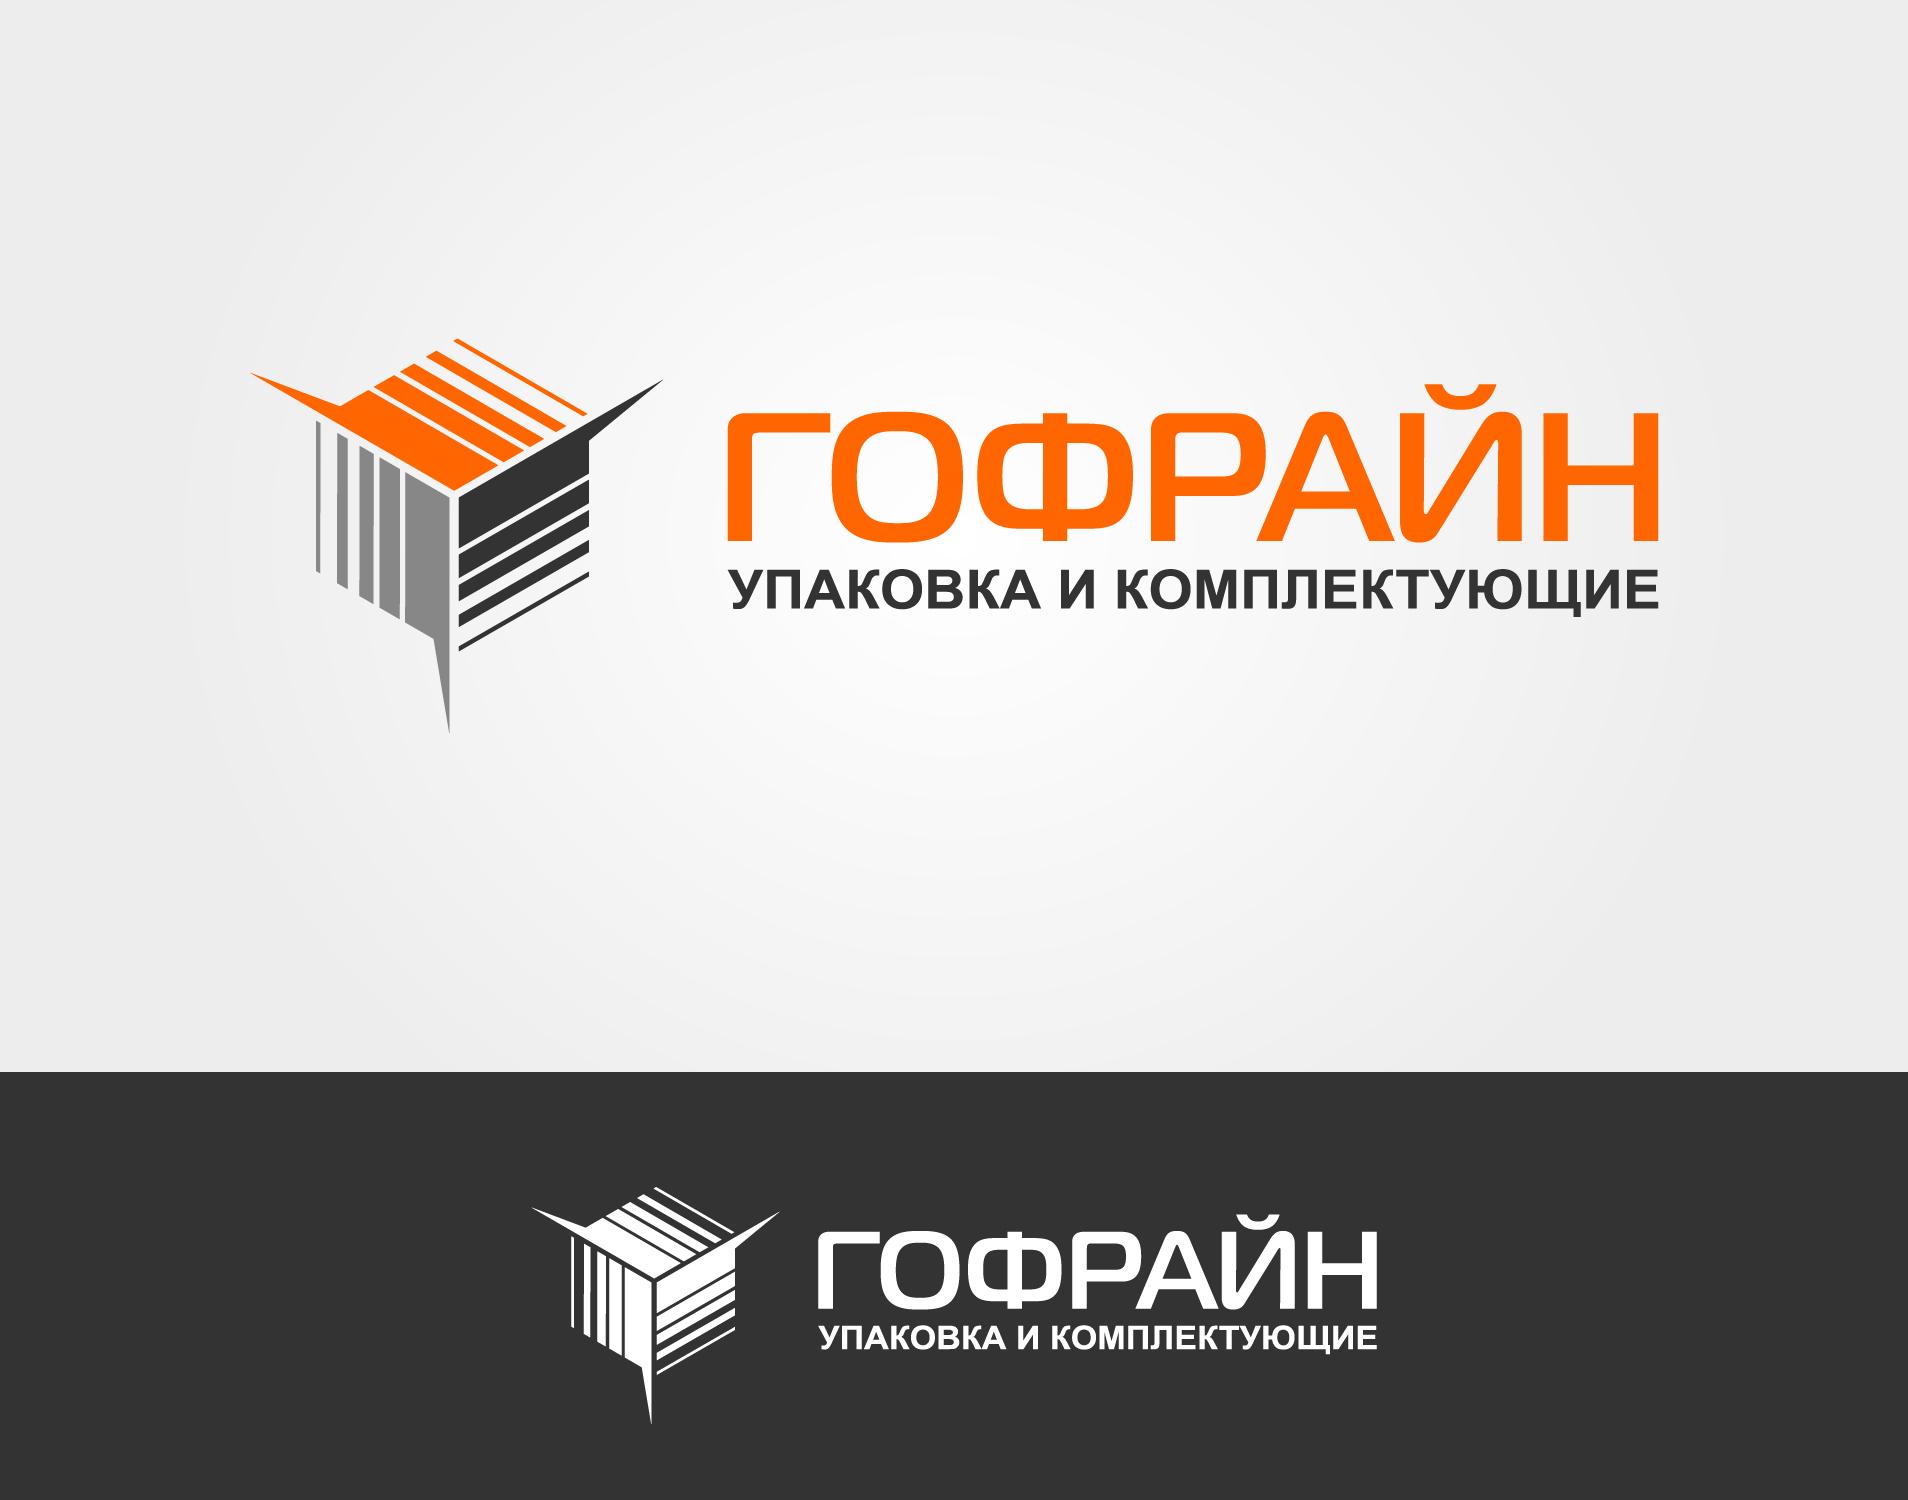 Логотип для компании по реализации упаковки из гофрокартона фото f_4985cdbafe2b50fc.jpg